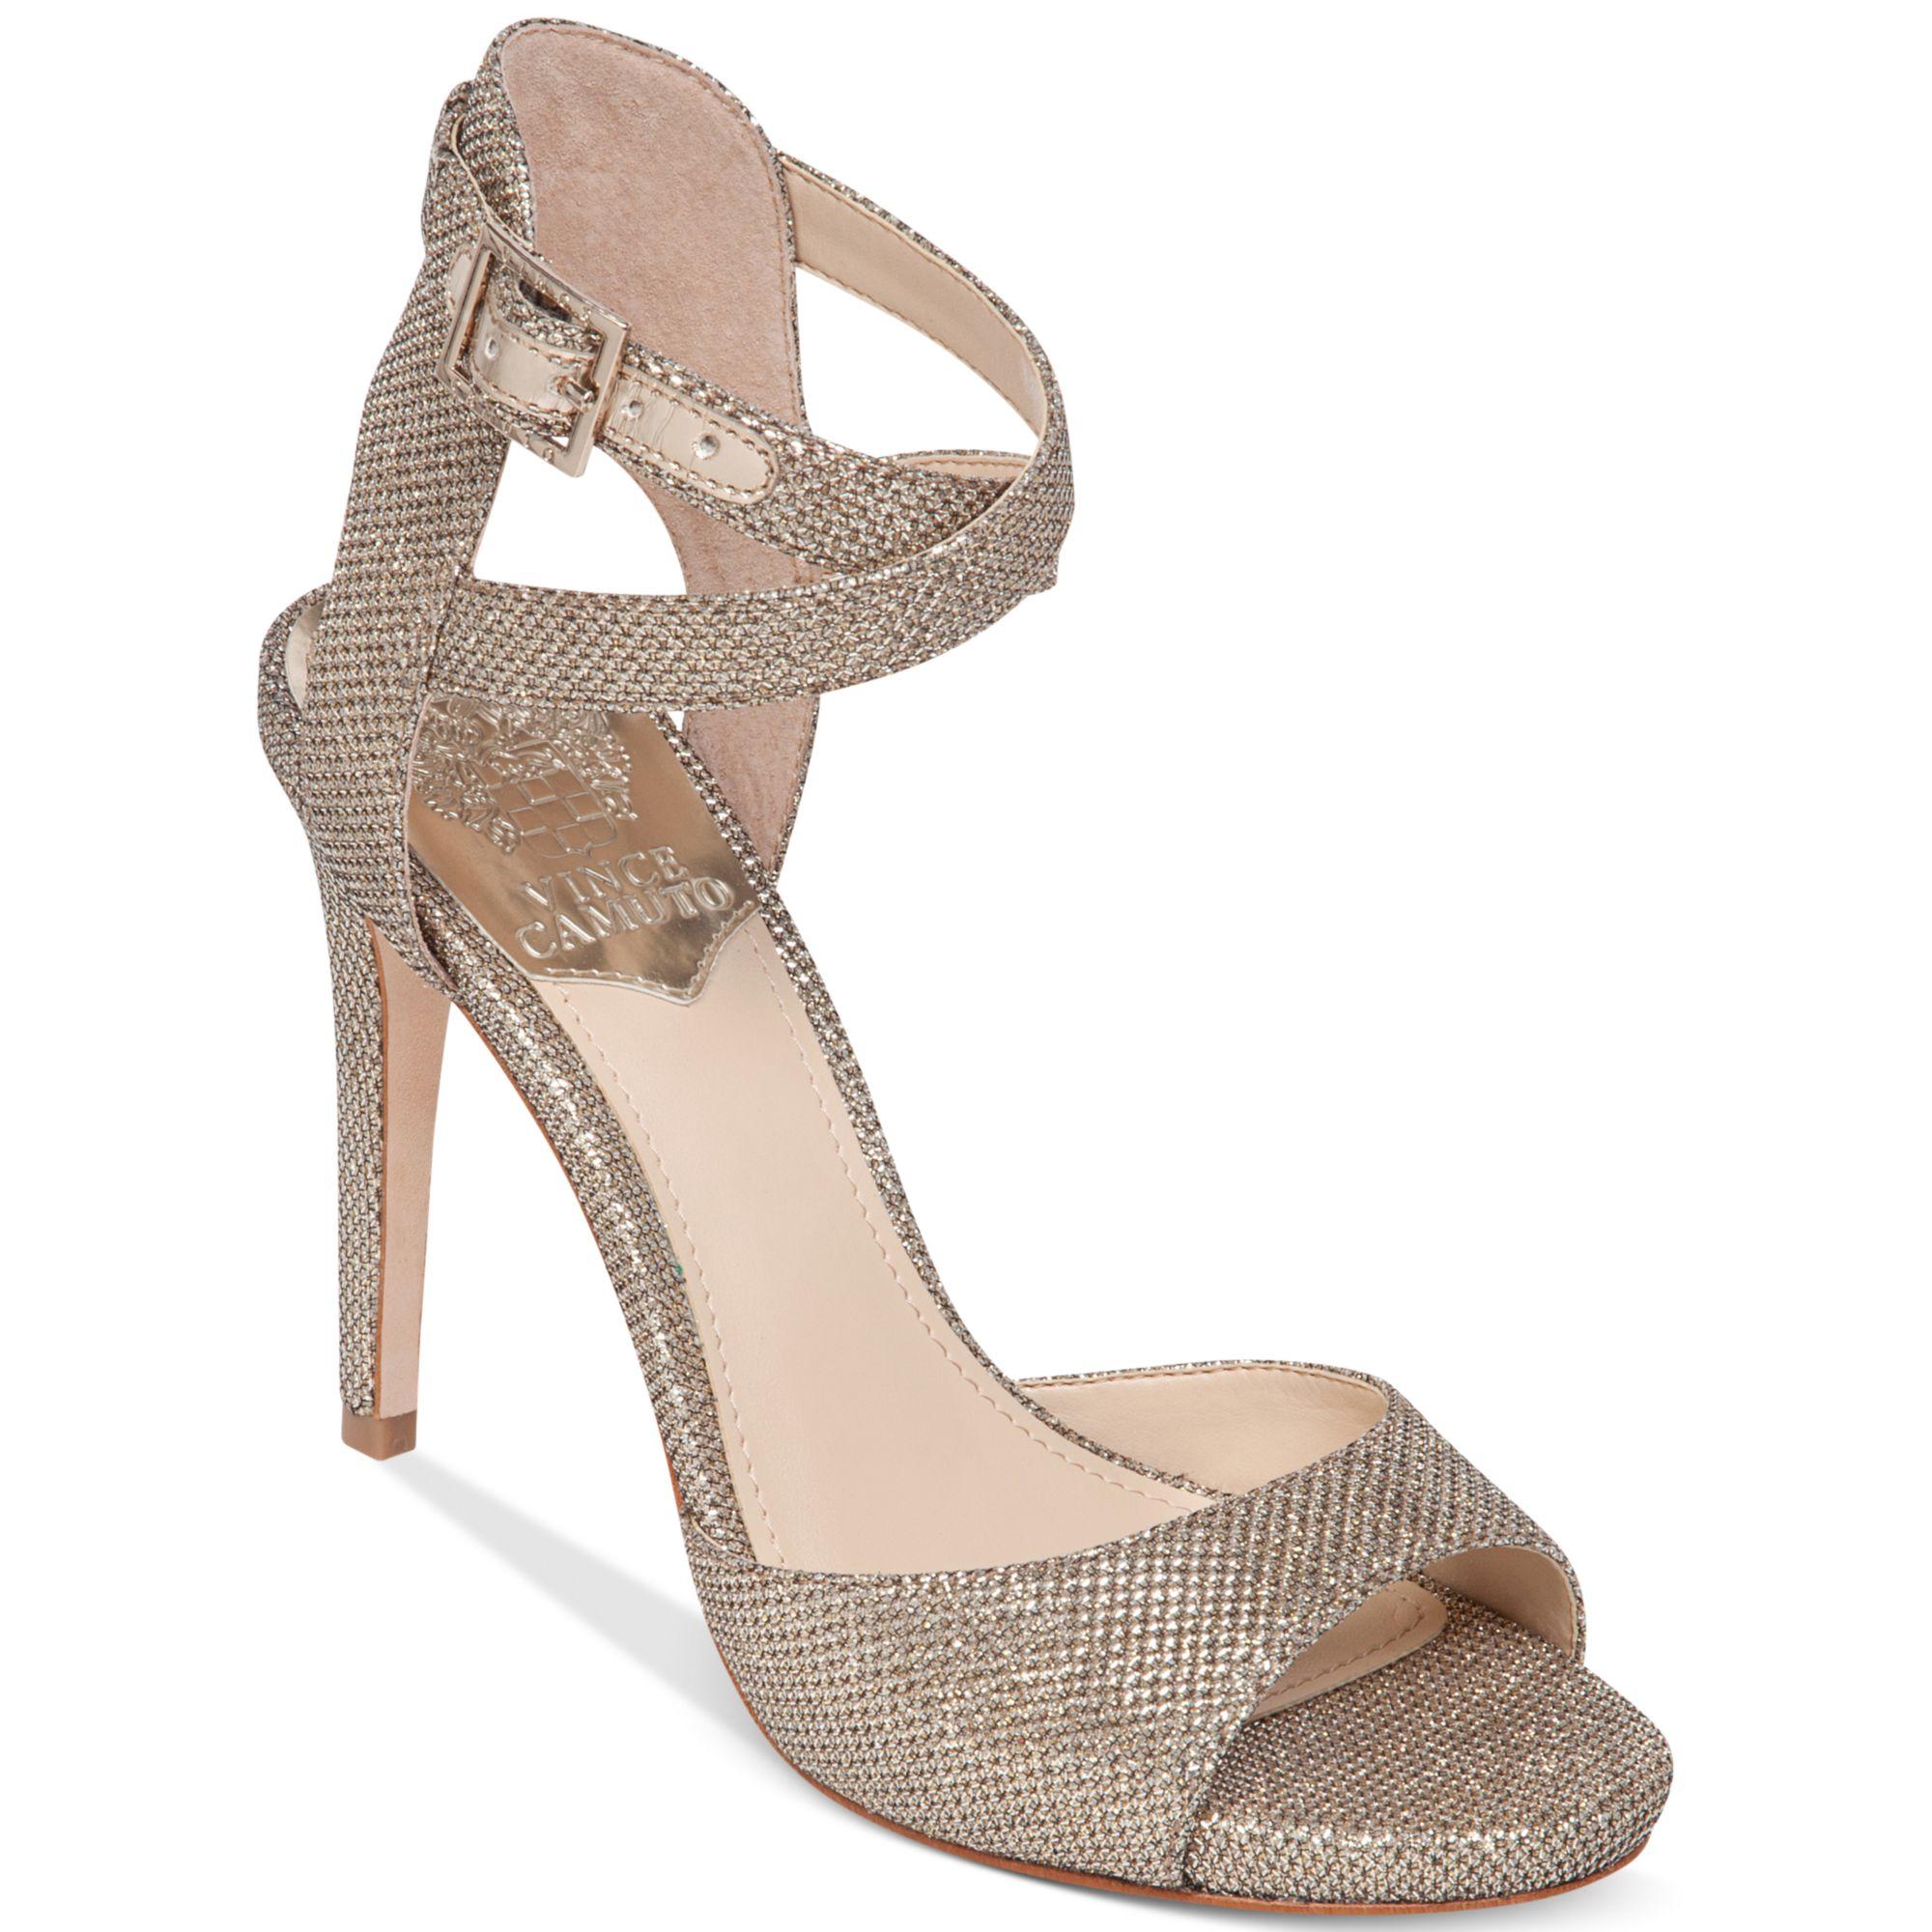 Vince Camuto Faunora High Heel Evening Sandals In Beige